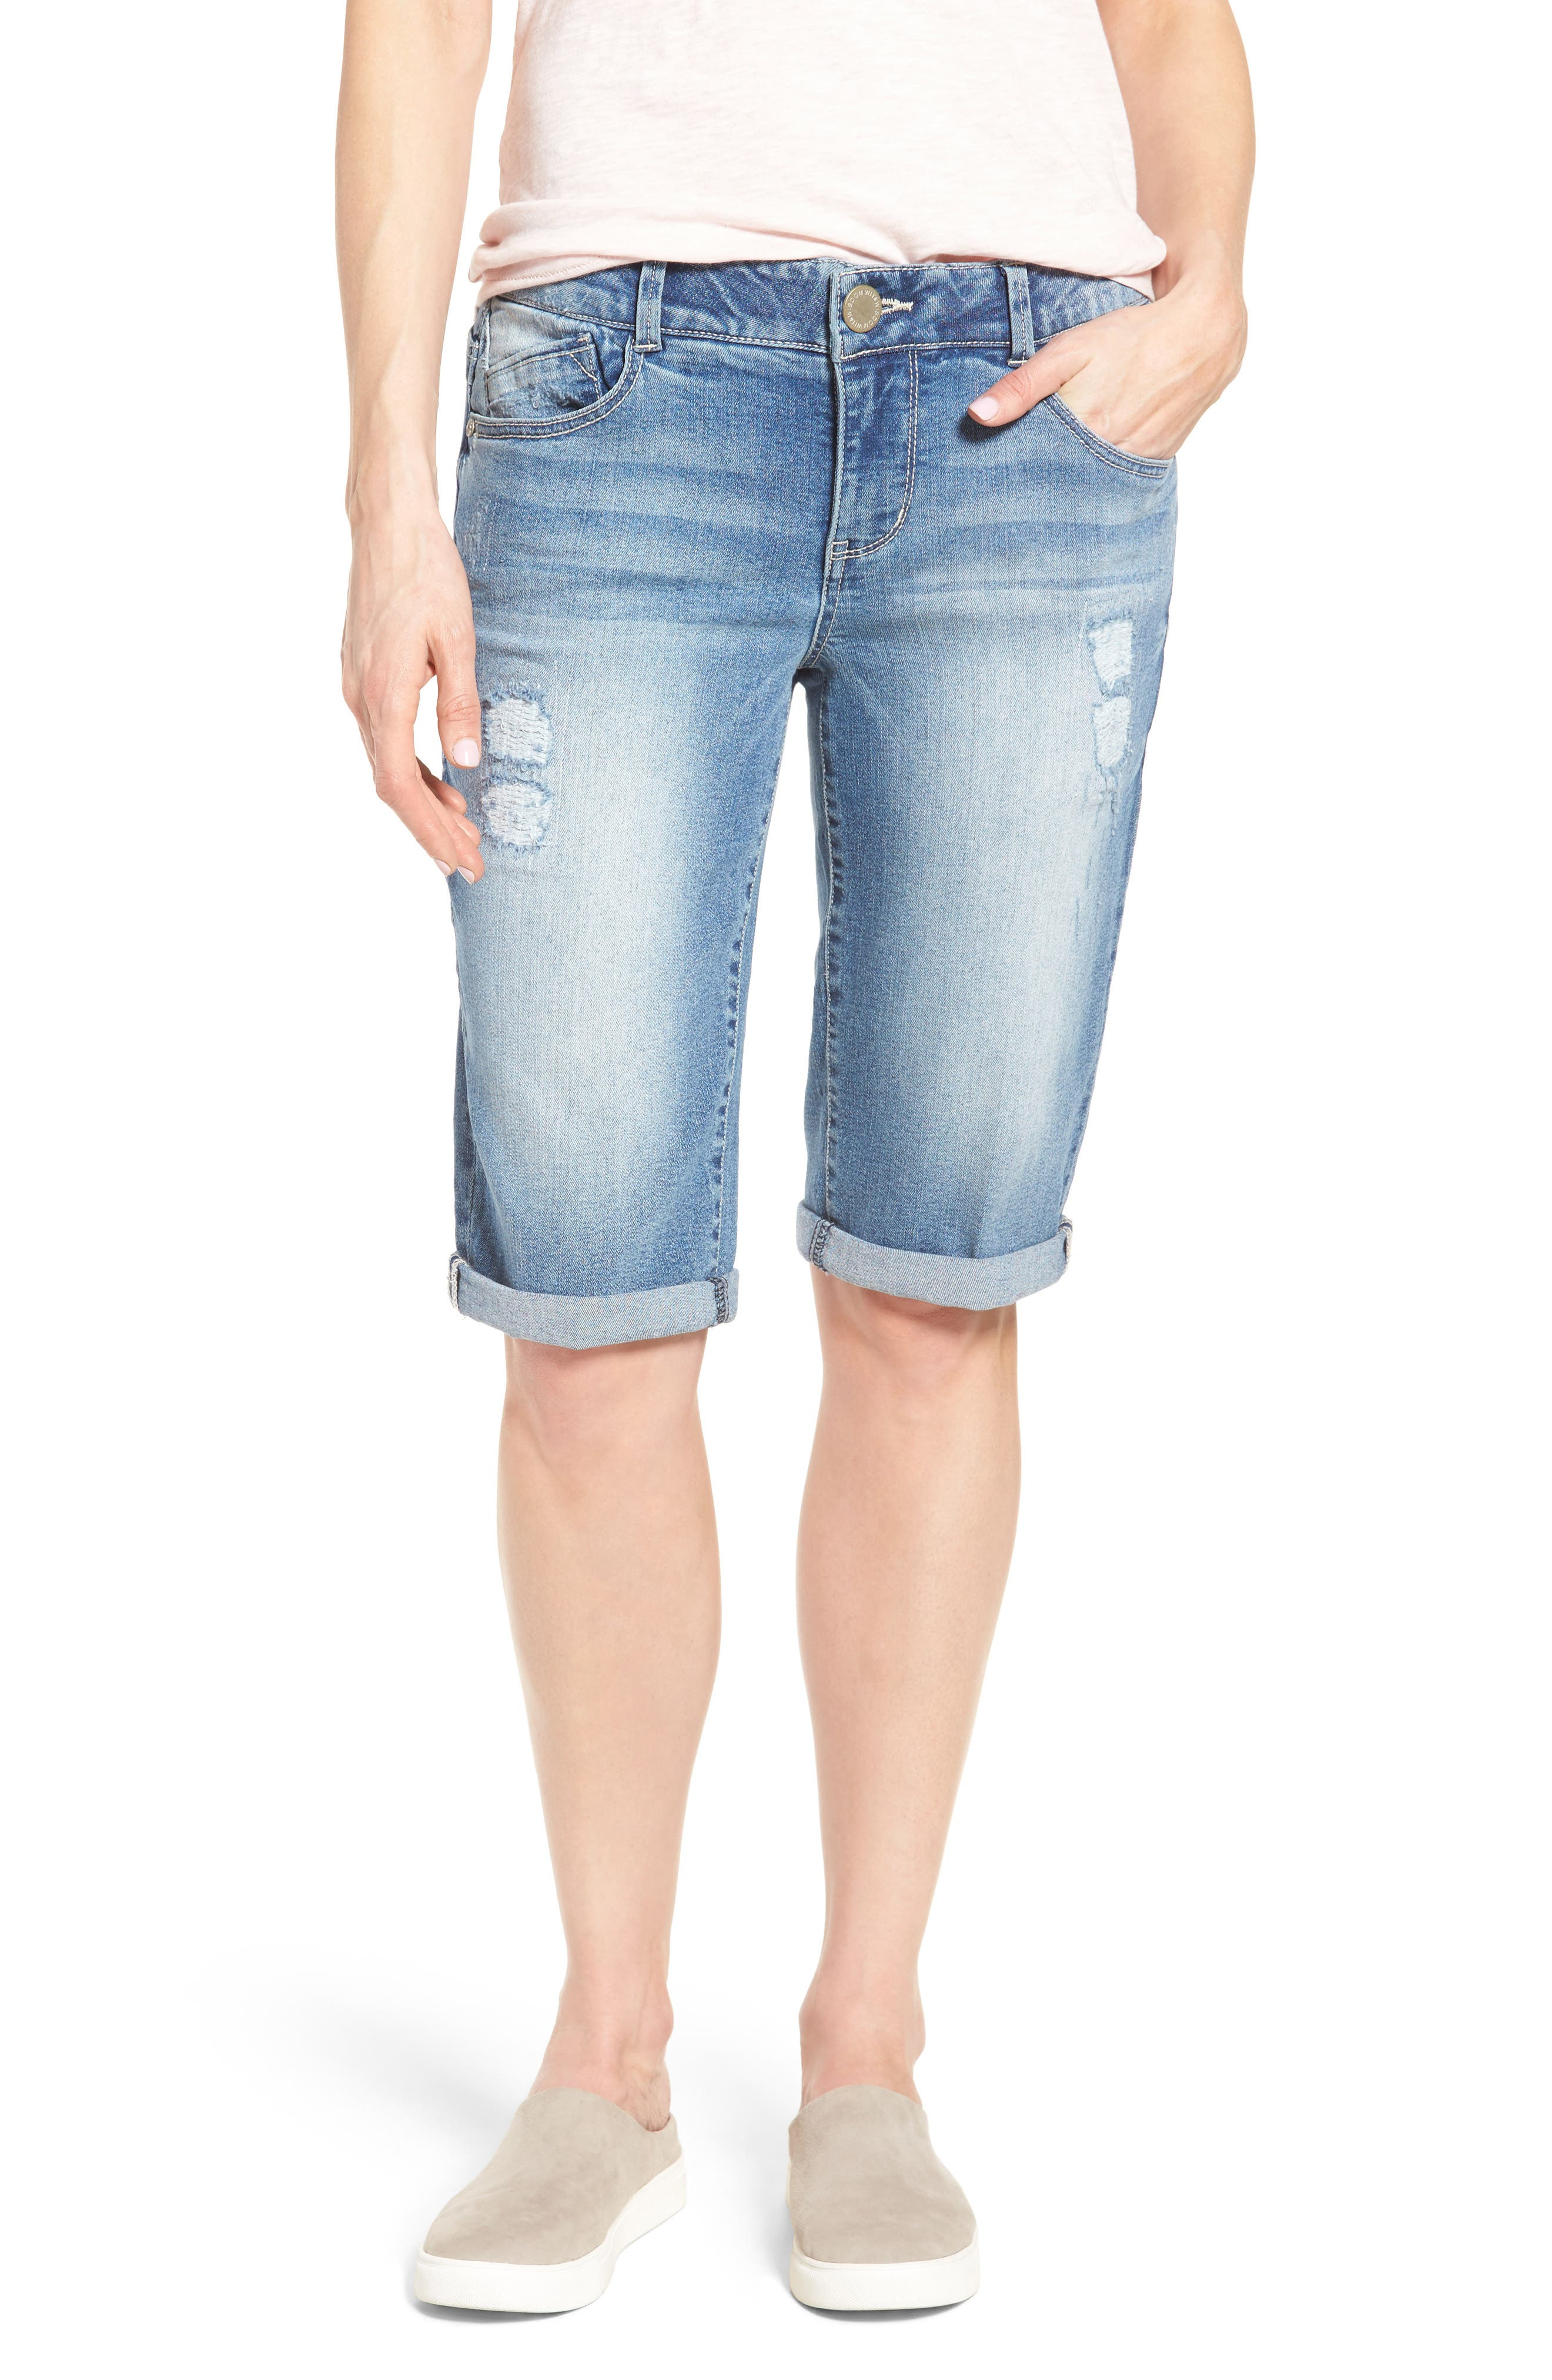 Main Image - Wit & Wisdom Ab-solution Ripped Denim Bermuda Shorts (Regular & Petite) (Nordstrom Exclusive)